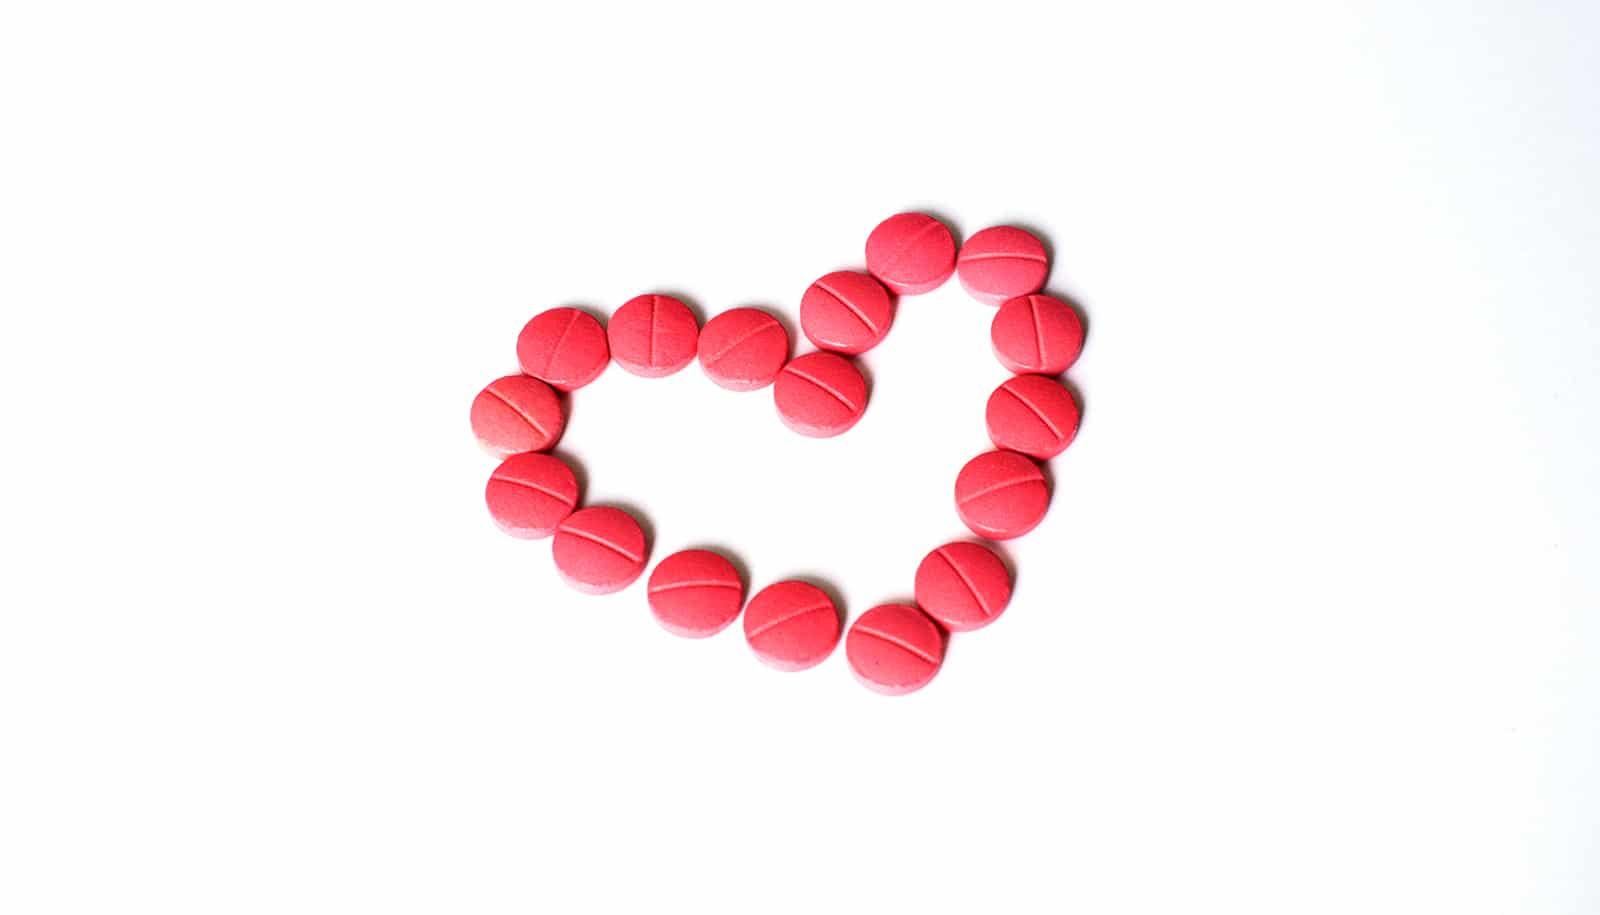 Ritalin Is Unlikely To Hurt Childrens >> Ritalin Is Unlikely To Hurt Children S Hearts Futurity